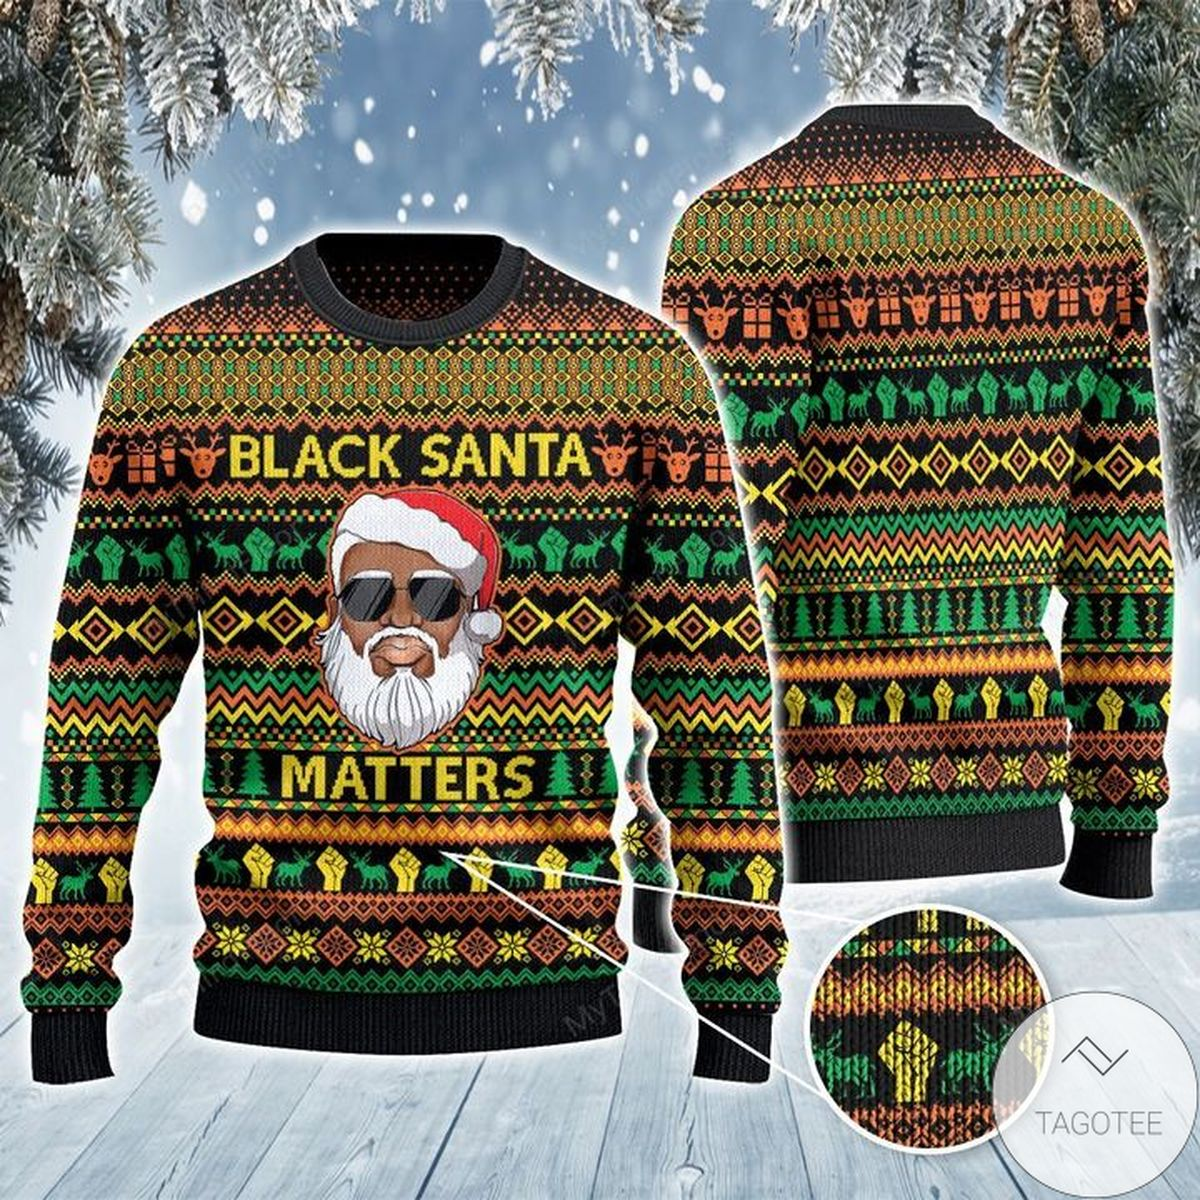 Black Santa Ugly Christmas Sweater